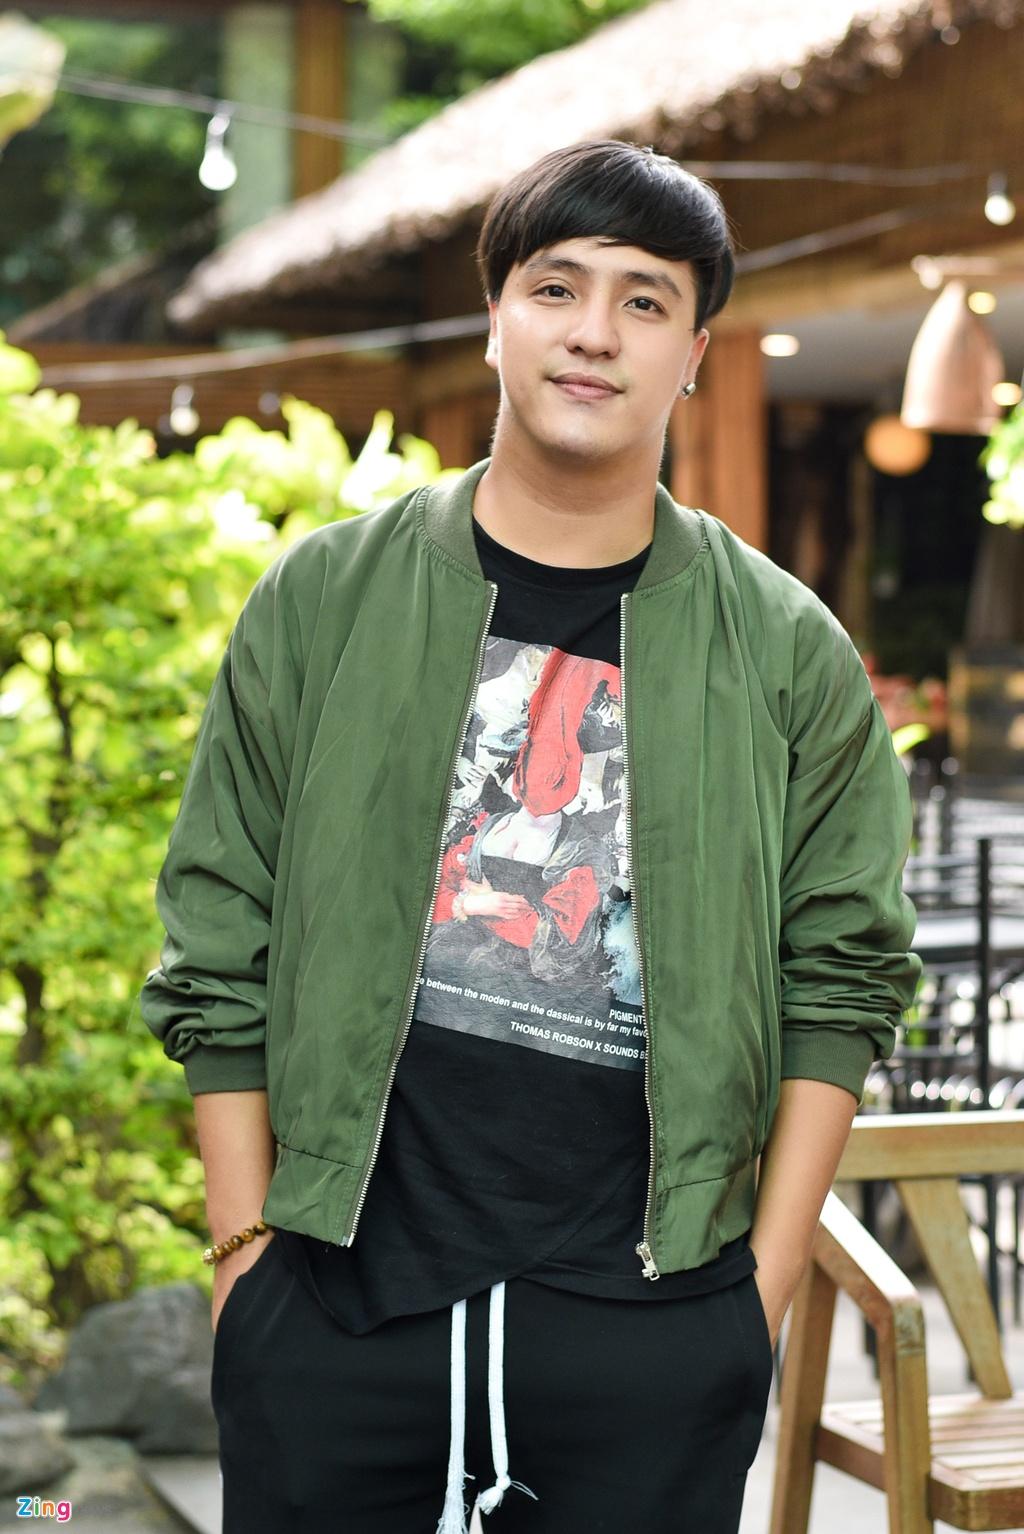 Ong bau chieu tro Tang Nhat Tue: 'Show nao co Tran Thanh, toi se ne' hinh anh 3